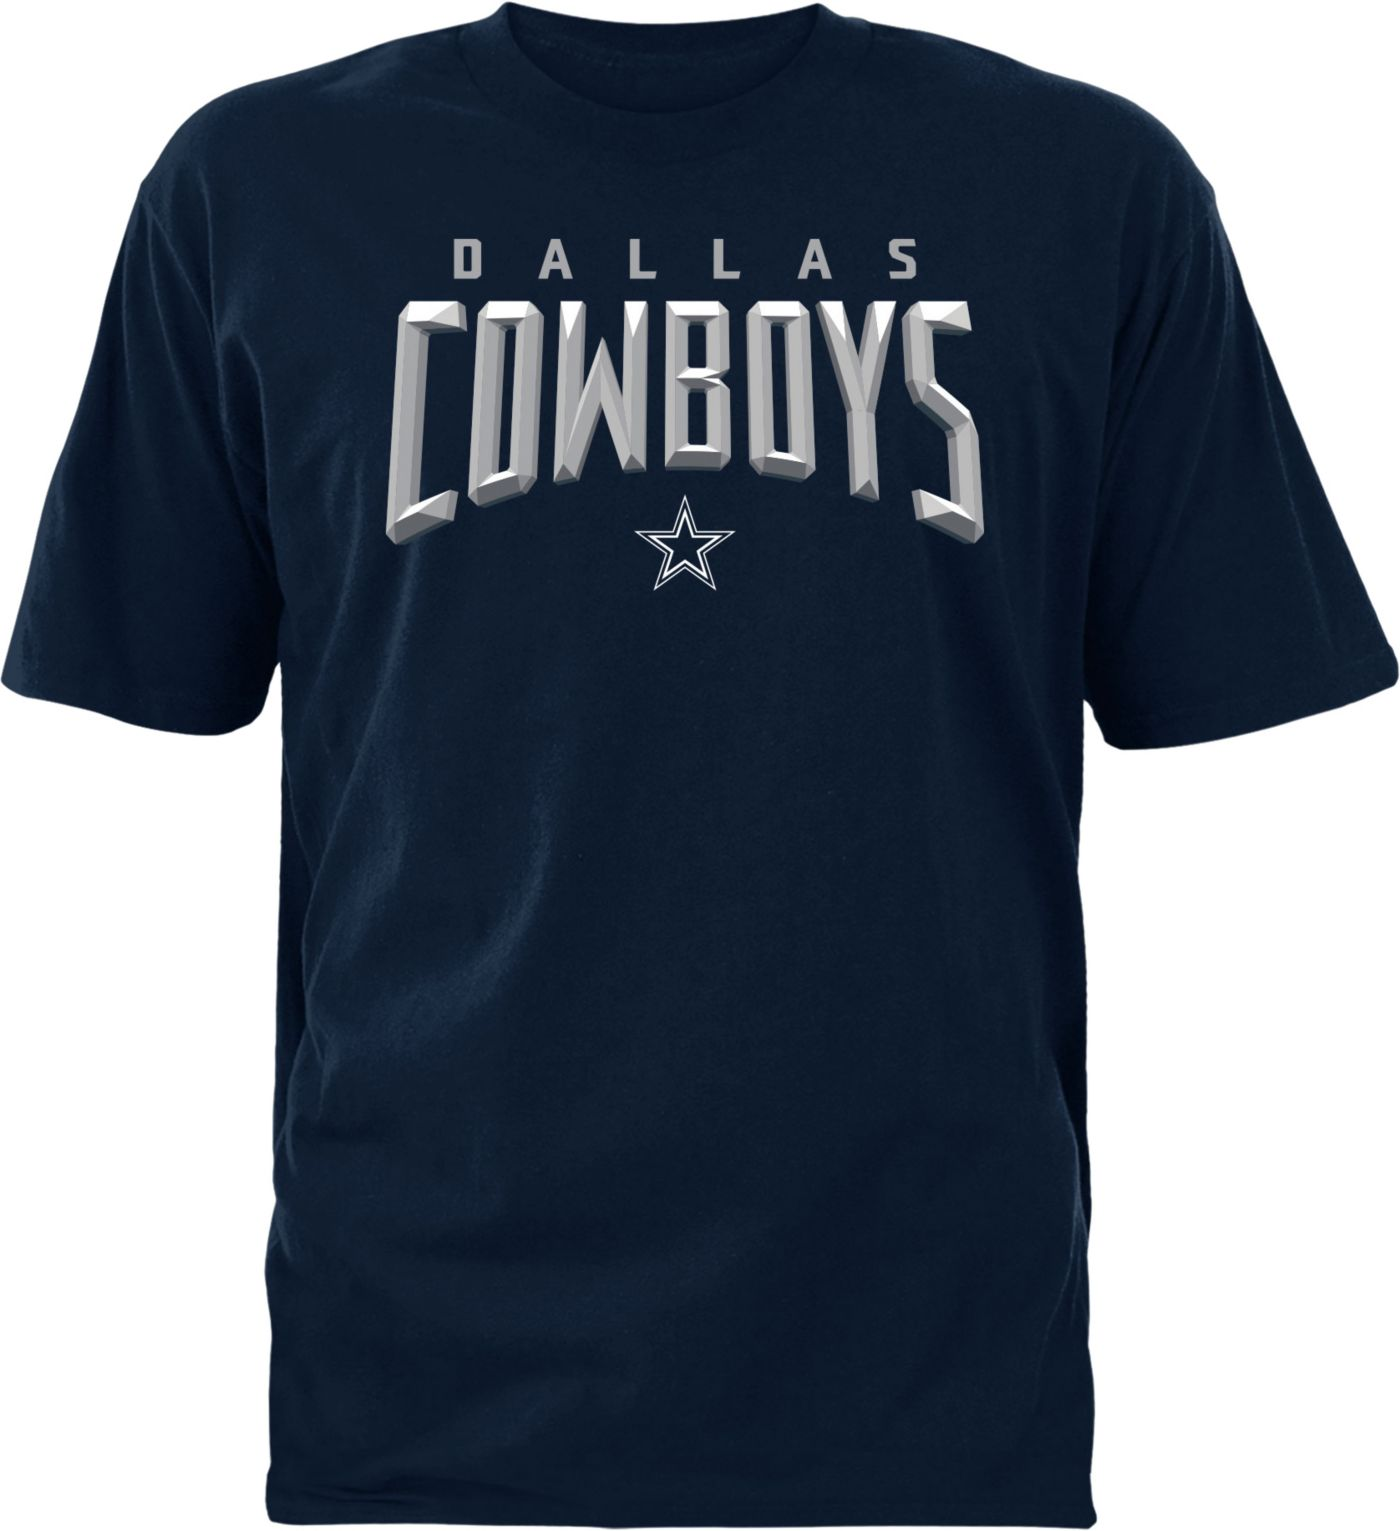 Dallas Cowboys Merchandising Men's Ambassador Navy T-Shirt